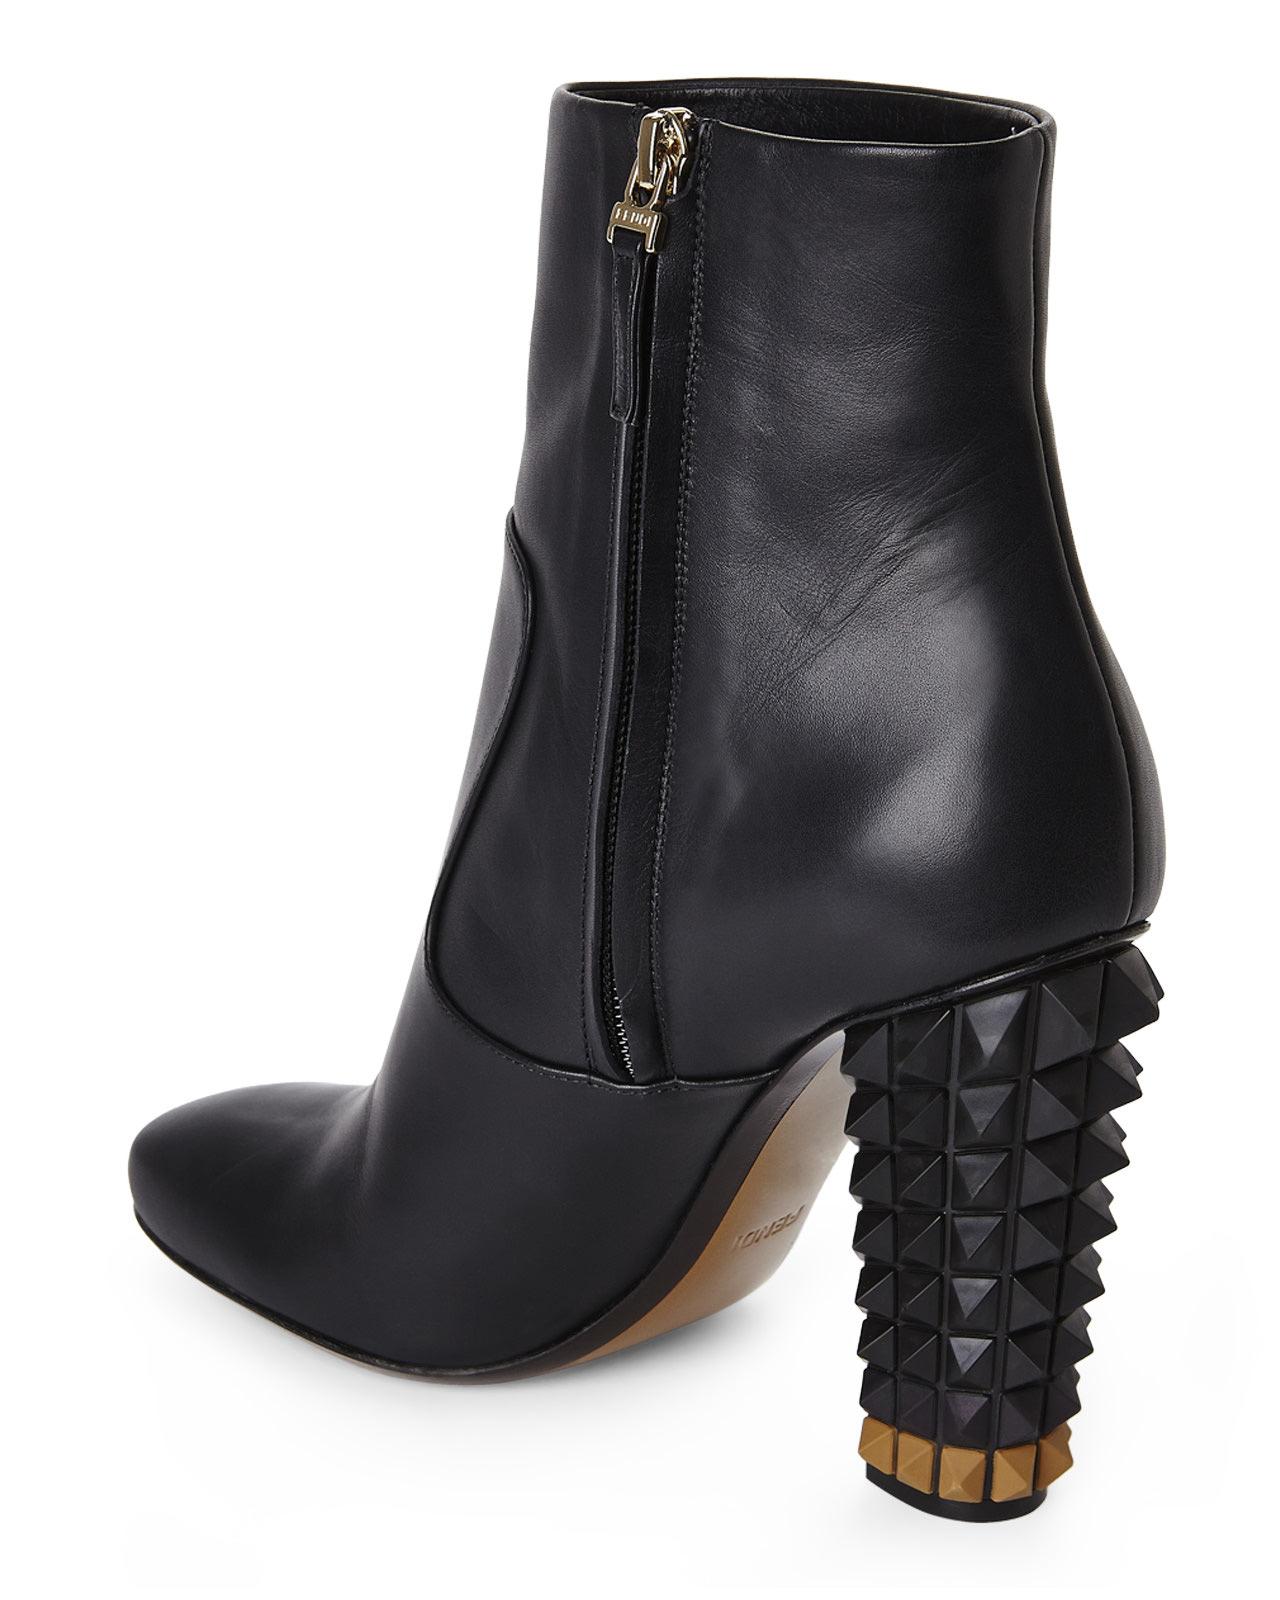 Lyst - Fendi Black Studded Heel Short Boots in Black dd7fb2112e67